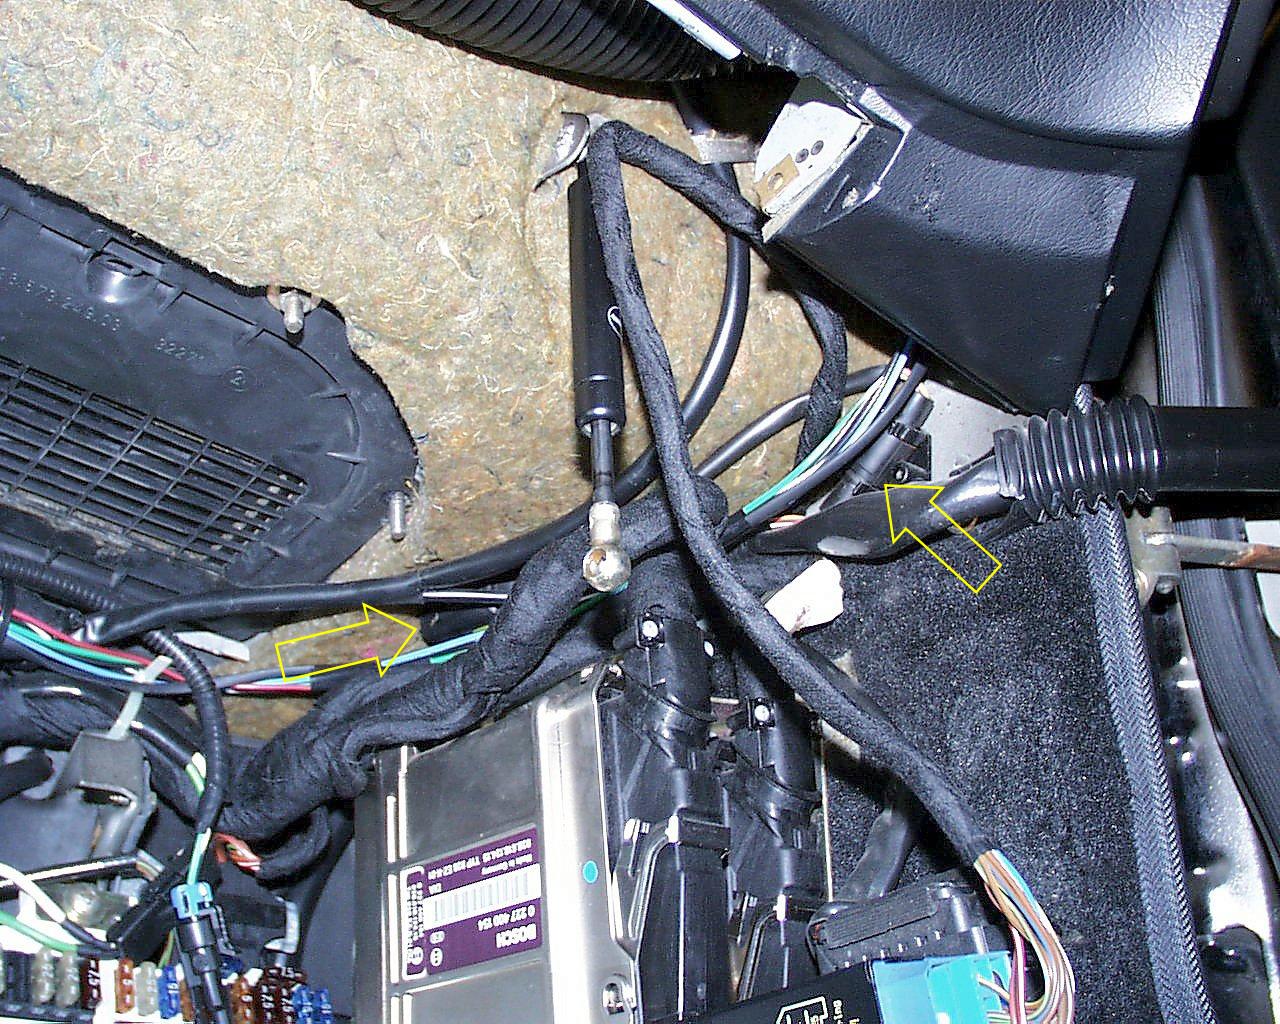 11 Pin Relay Socket Wiring Diagram Help 1990 Wiring Diagram Right Front Crash Sensor